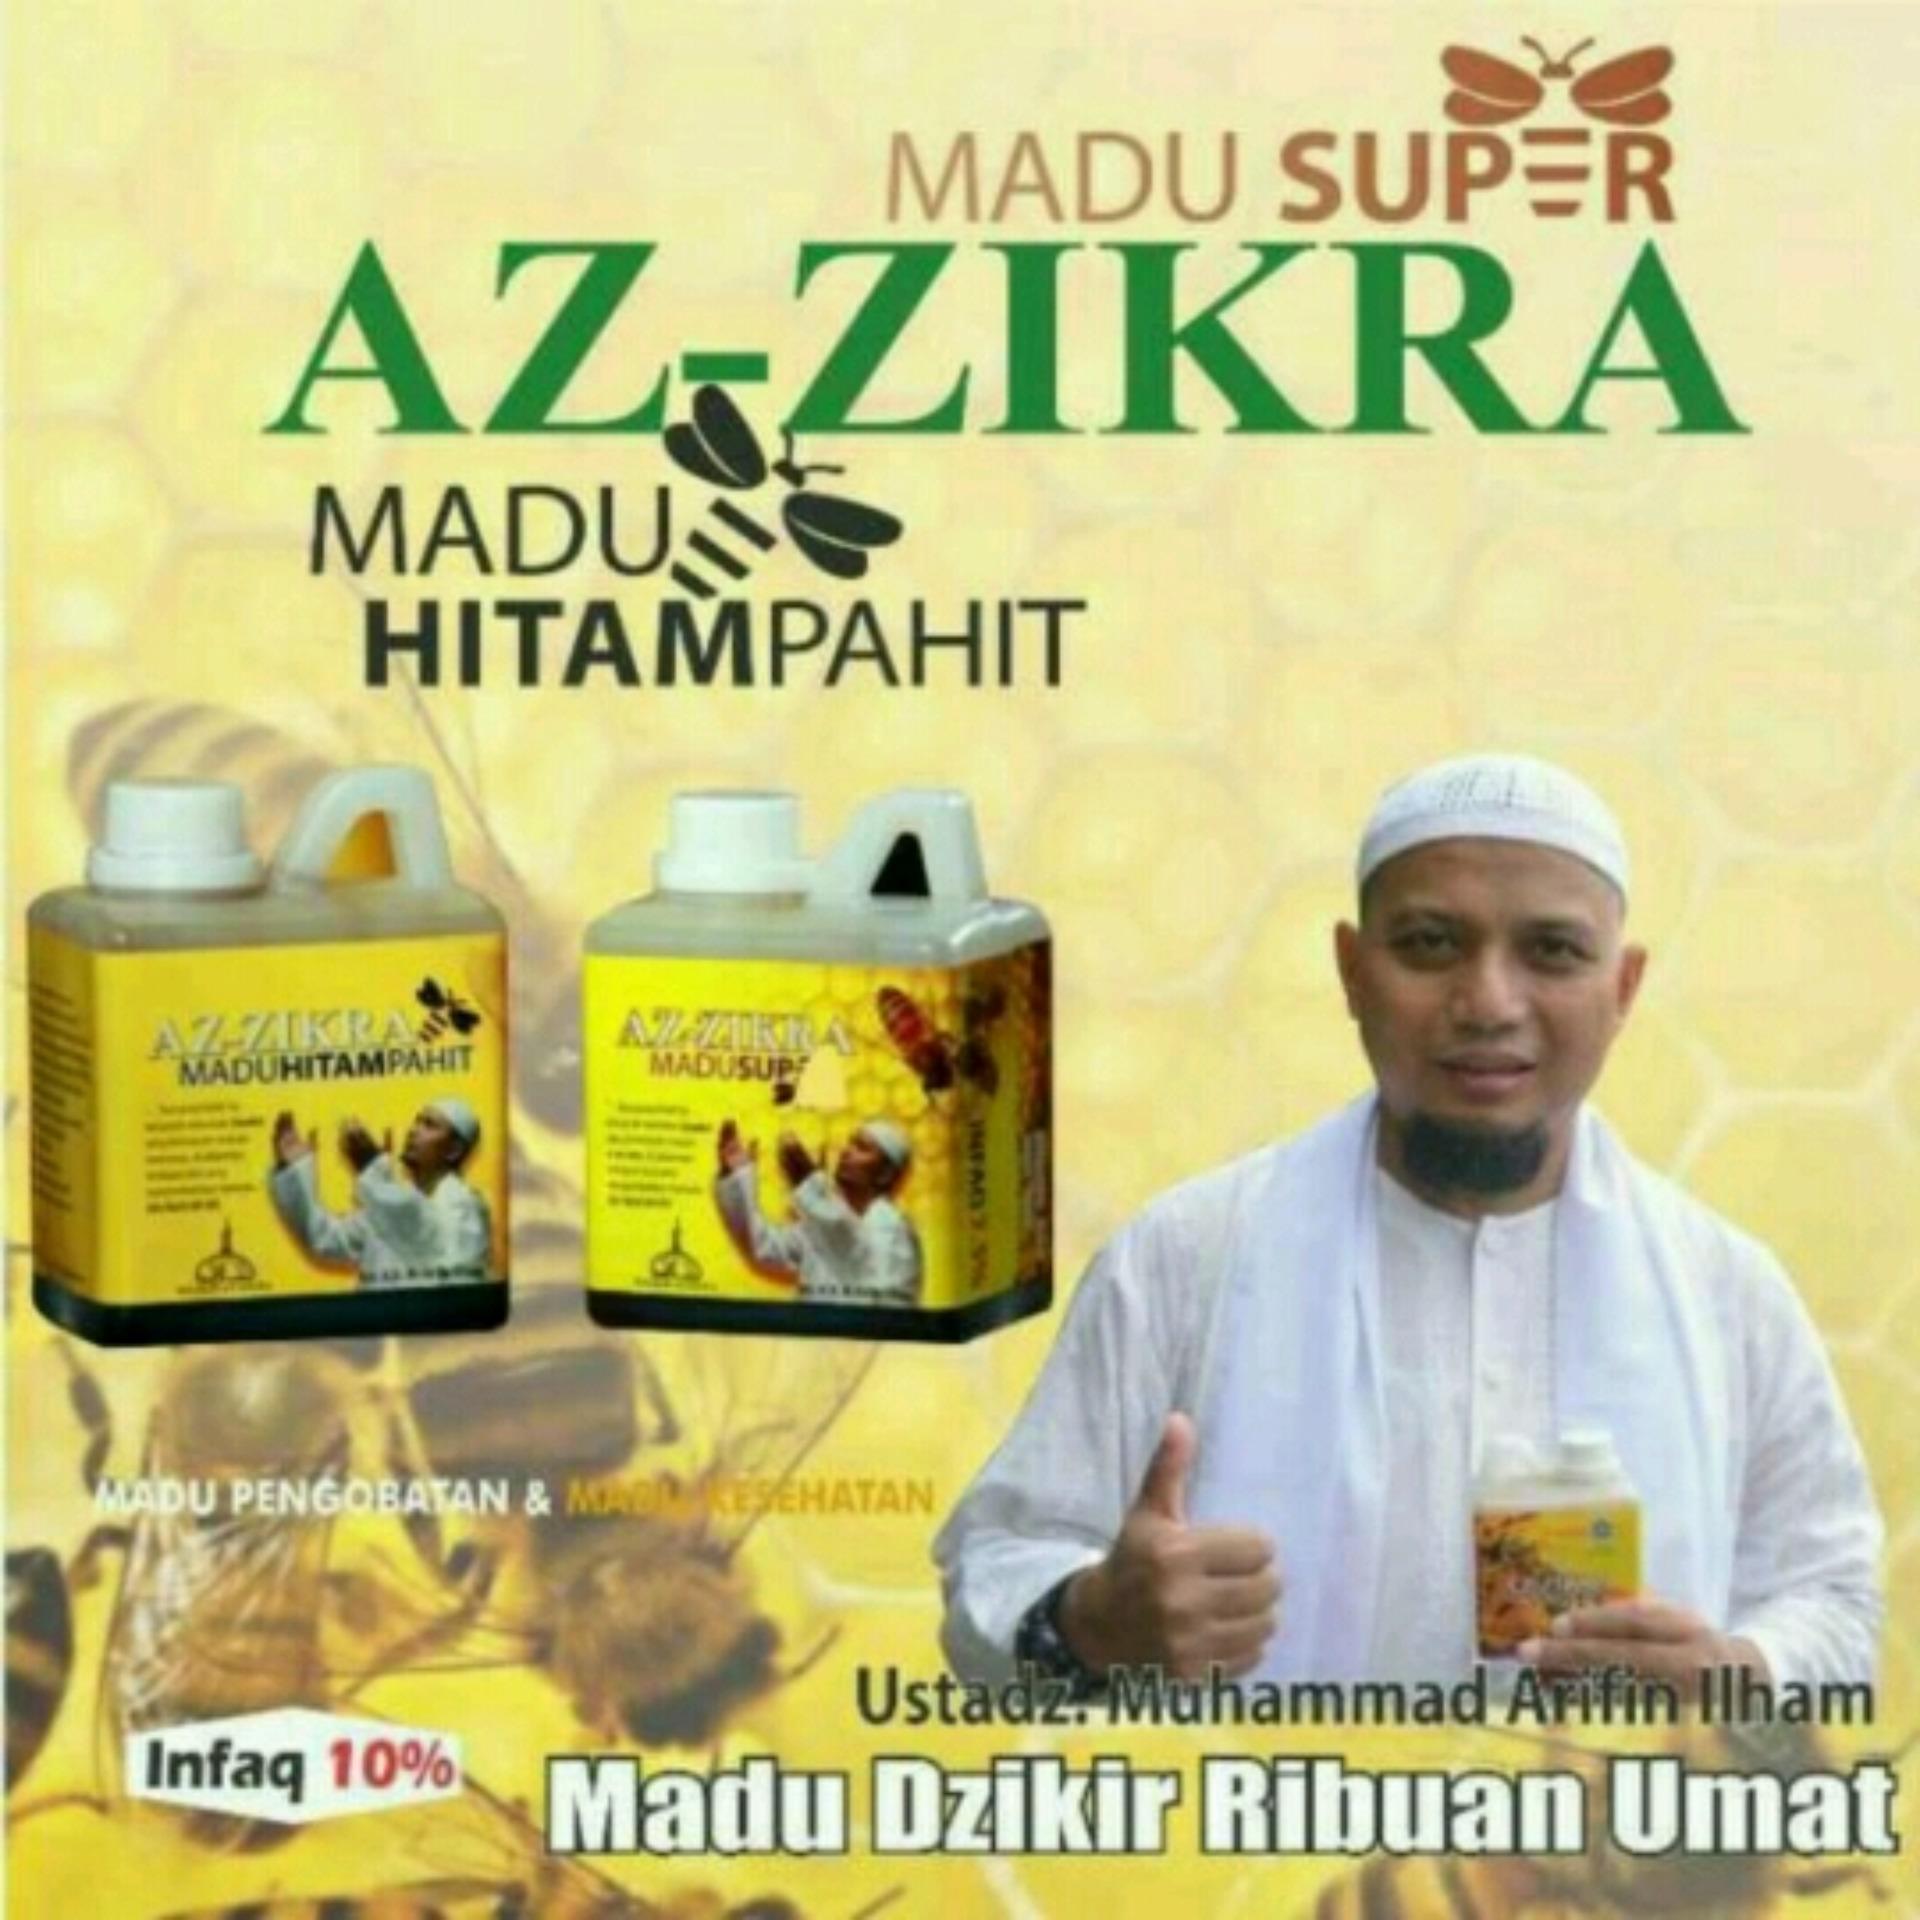 Madu Hitam Pahit Az Zikra Ampuh Atasi Berbagai Penyakit Dan Halal Super Terbaik Ustadz Arifin Lazada Indonesia